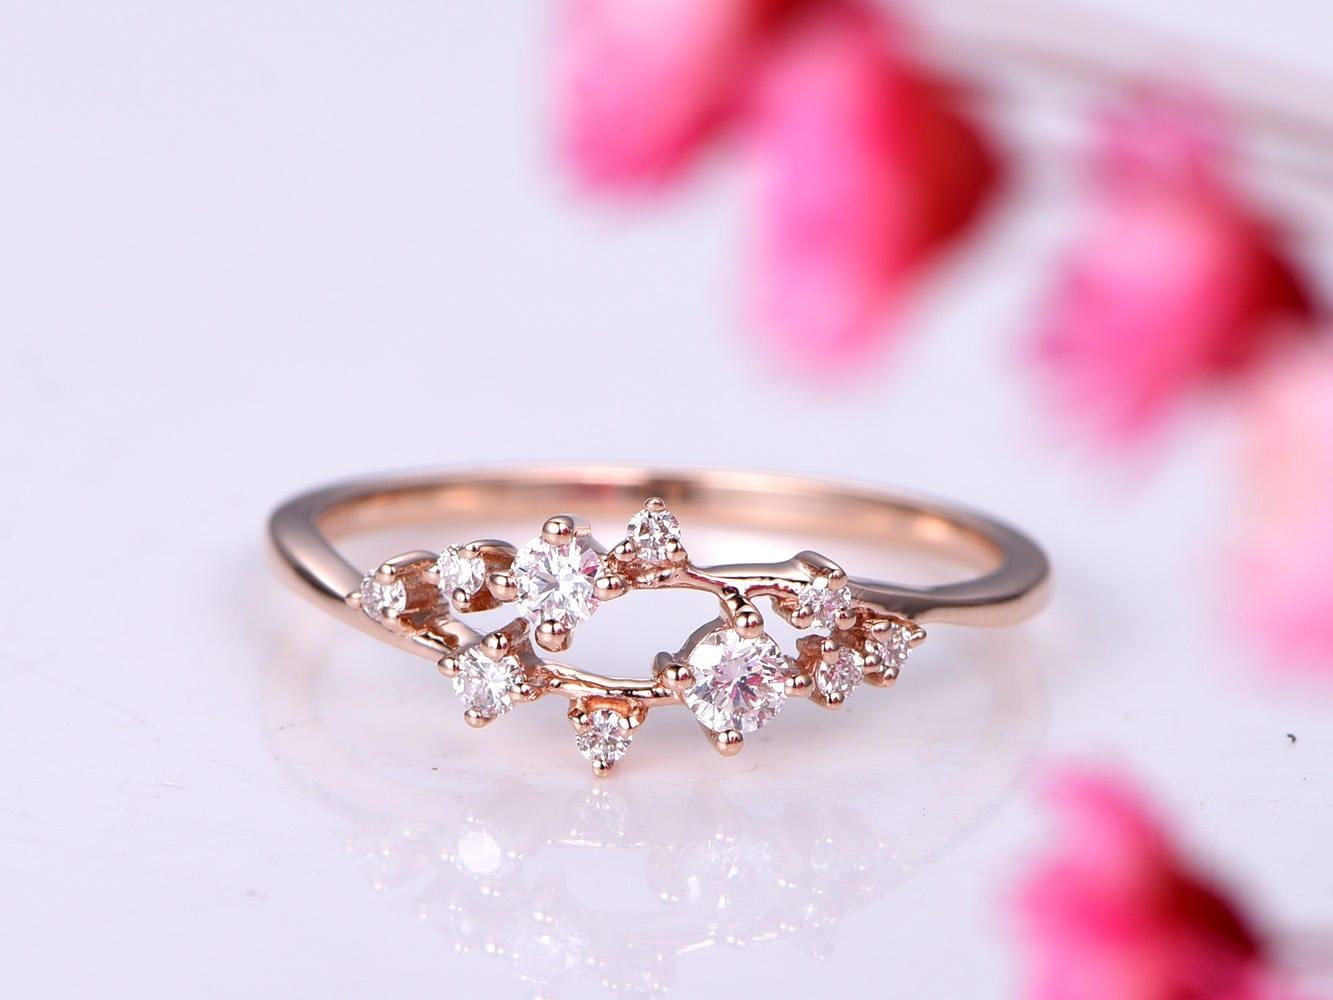 Diamond ring diamond engagement ring wedding band sakua design